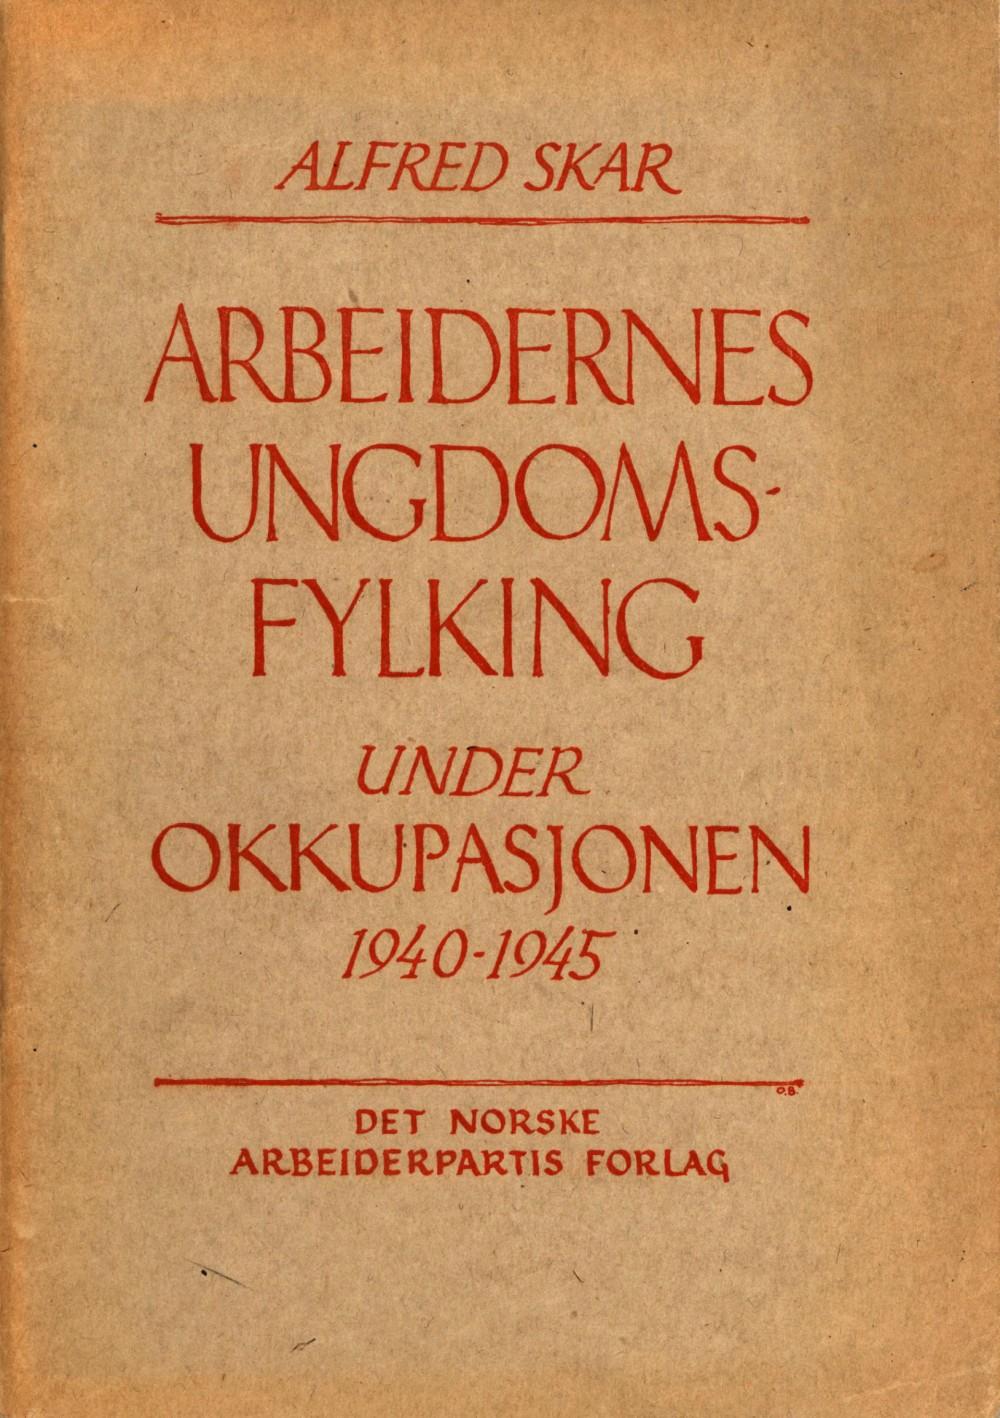 Alfred Skar: Arbeidernes Ungdomsfylking under okkupasjonen 1940-1945